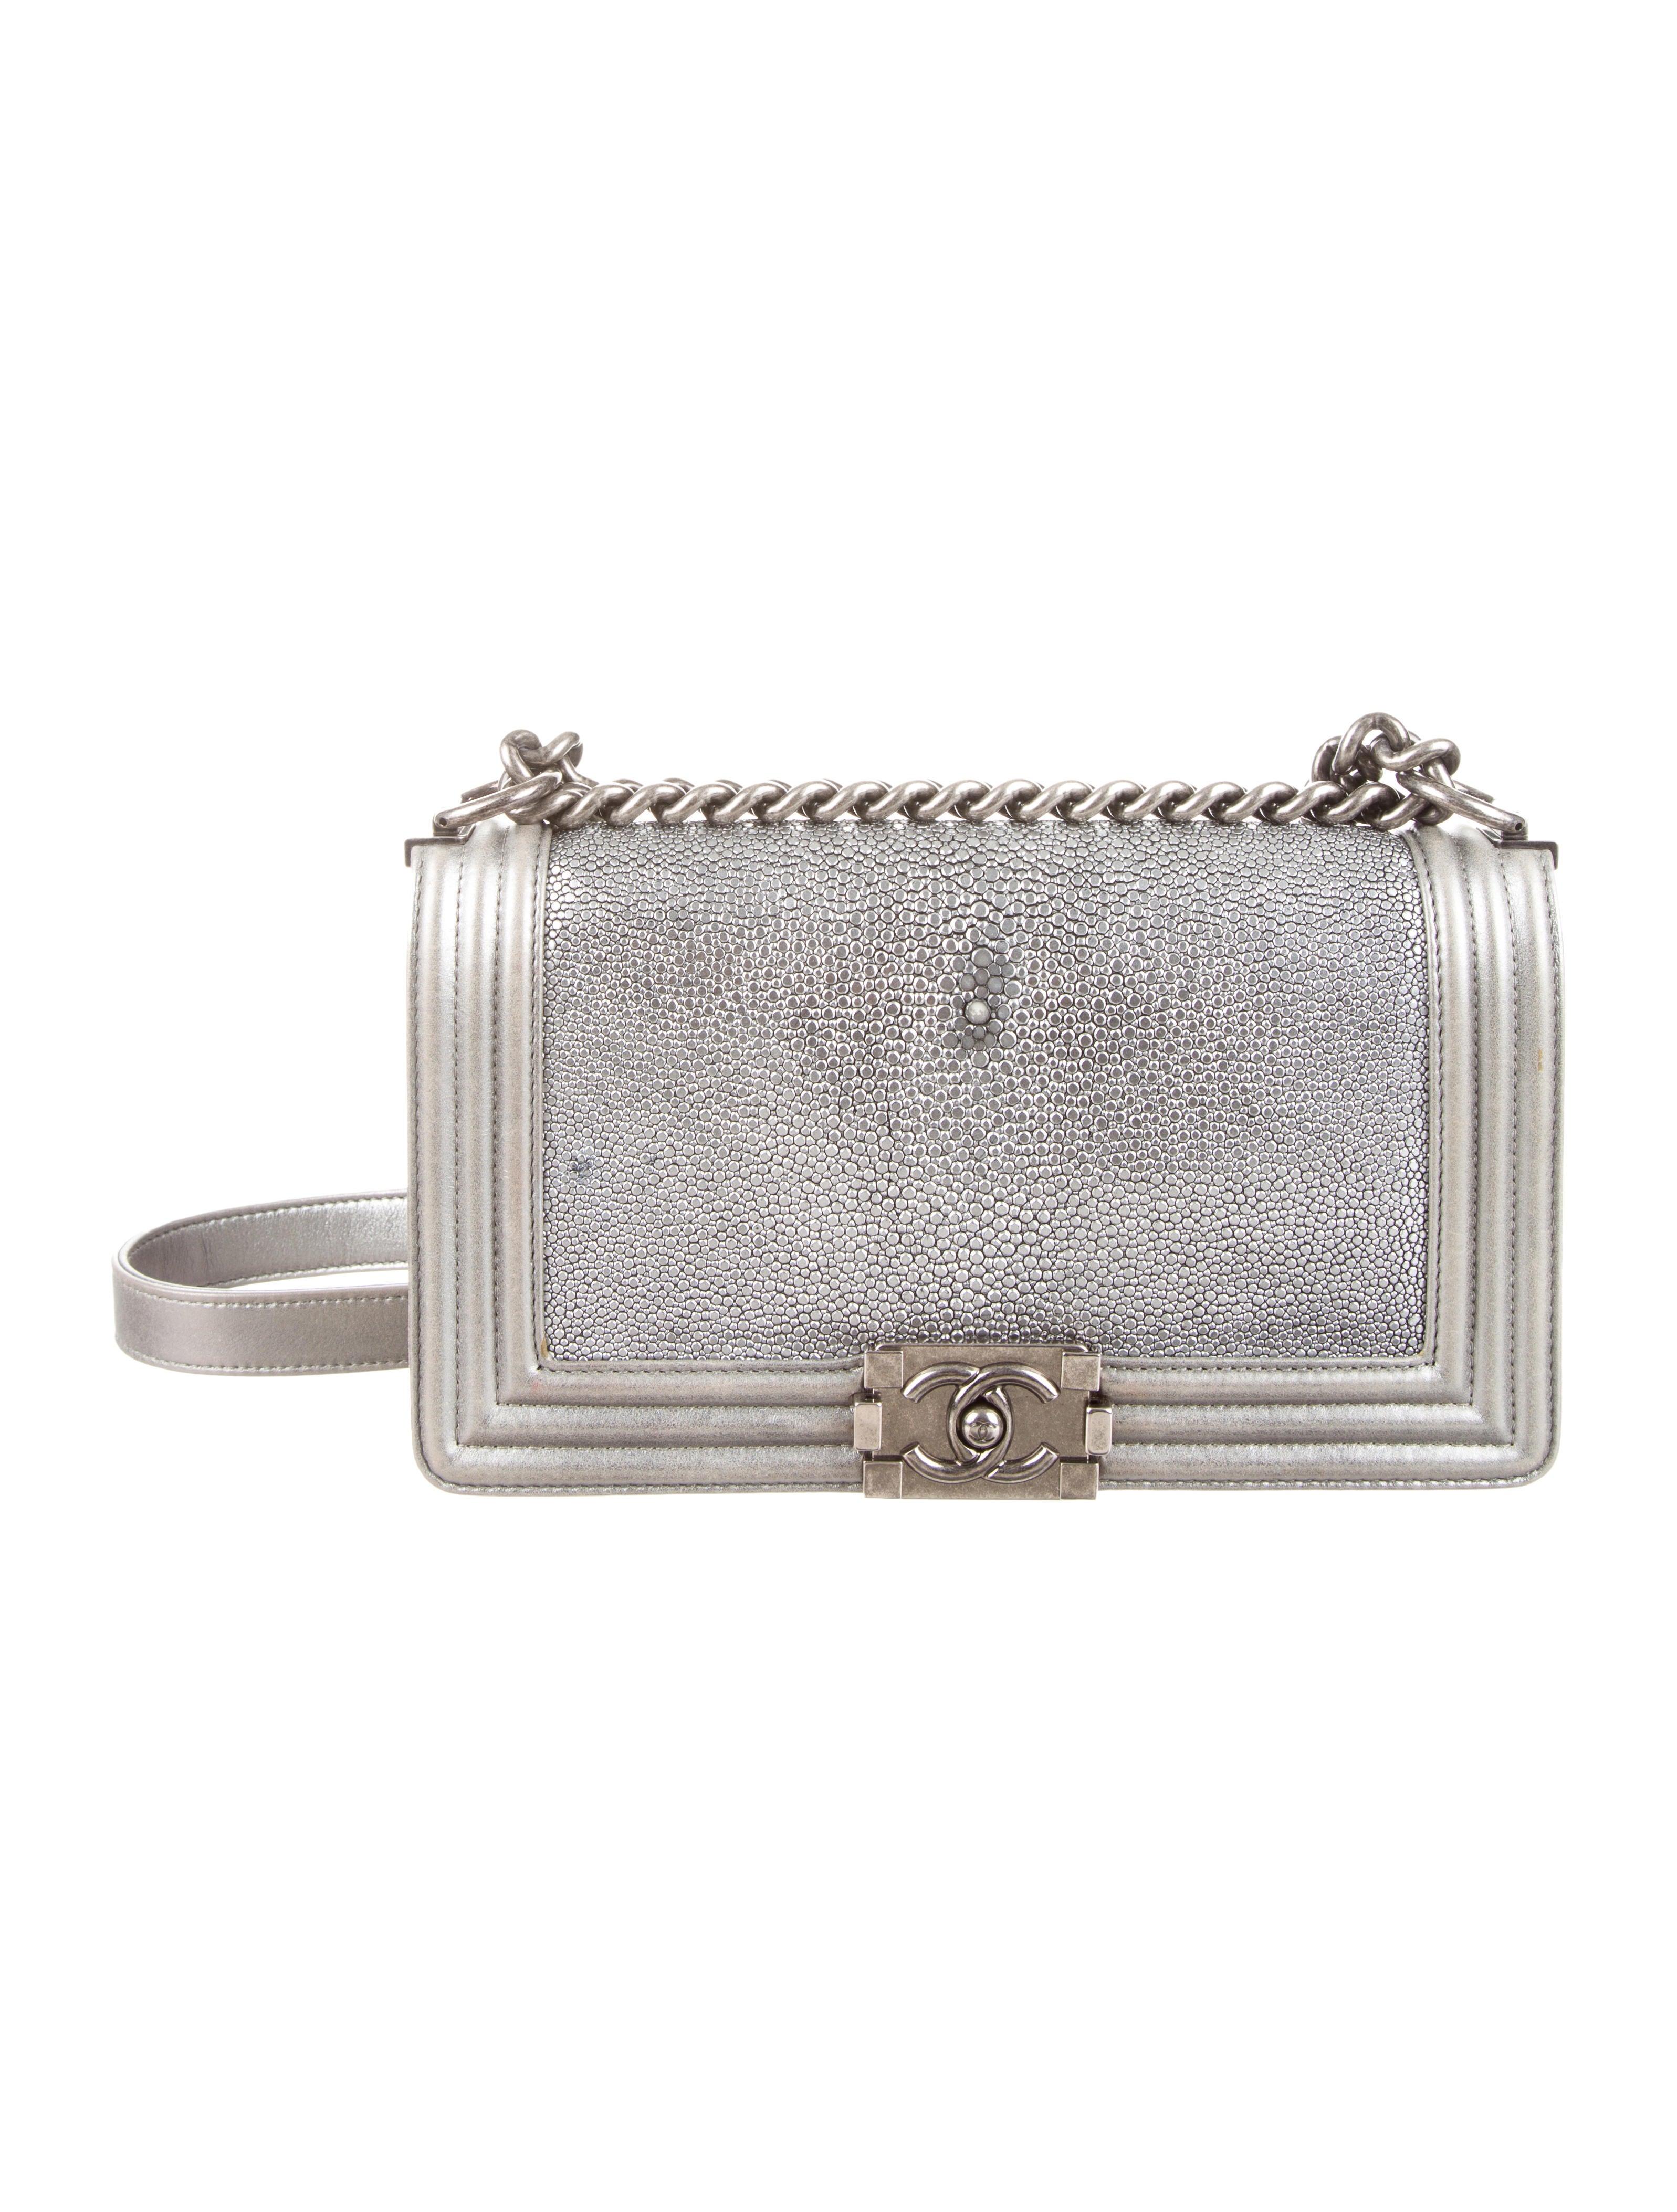 a013914b224328 Chanel Medium Stingray Boy Bag - Handbags - CHA85819 | The RealReal